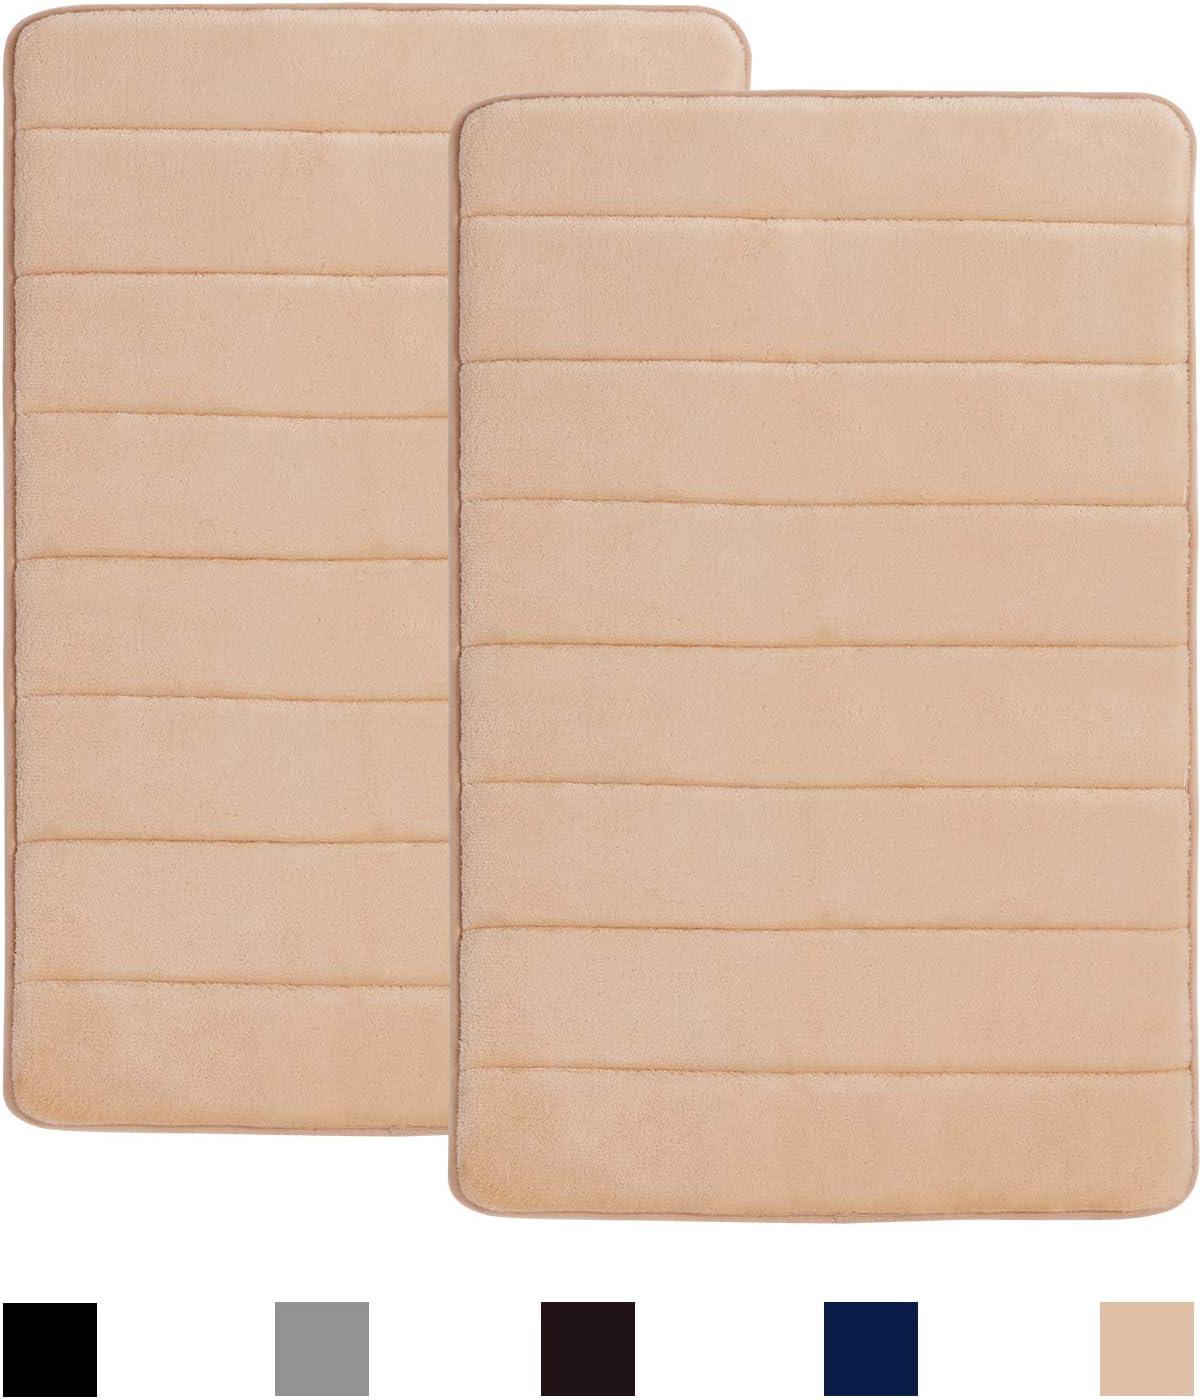 Memory Foam Bath Mat Latest item New popularity Rug Soft Anti-Fatigue KIMODE Absorbent